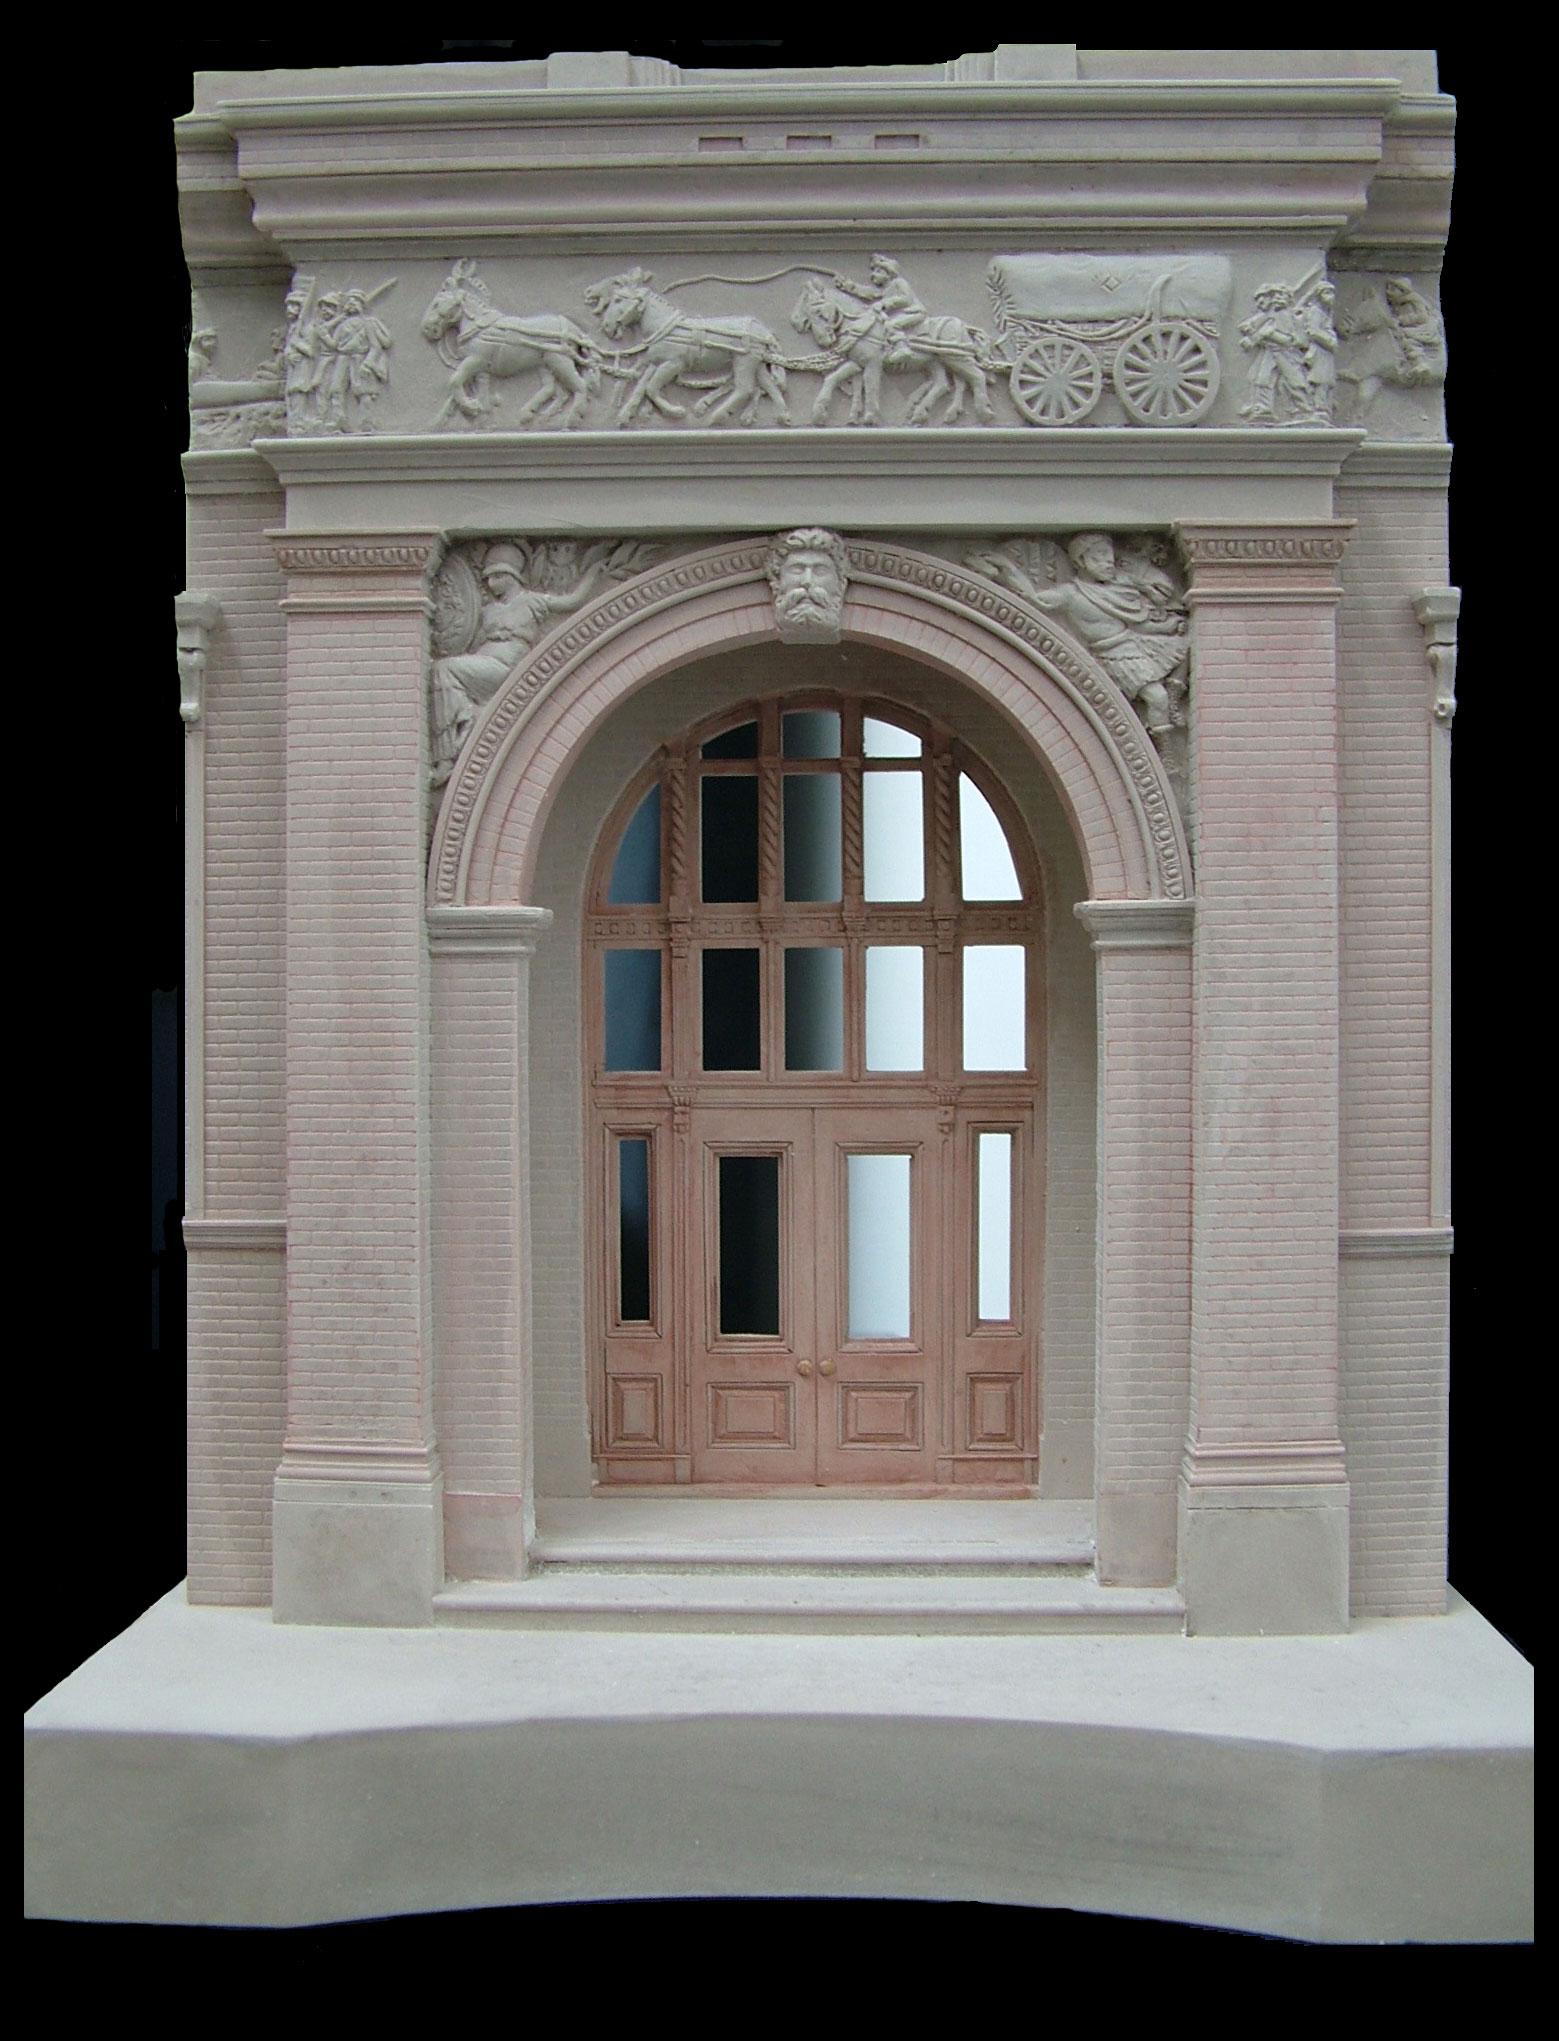 palladio29national-building-museum